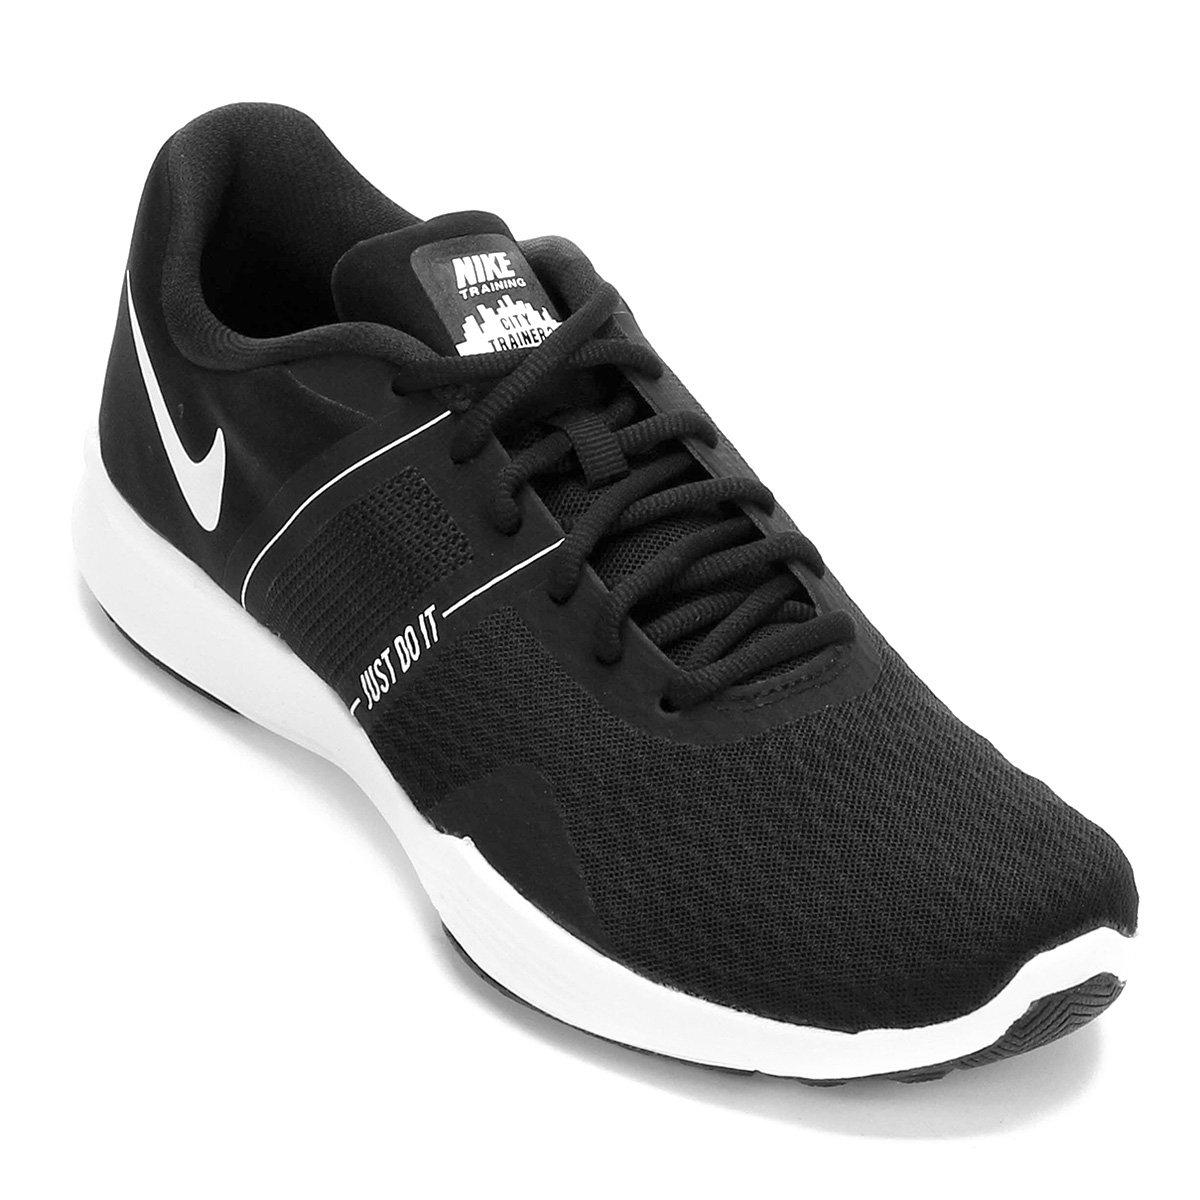 Tênis Nike City Trainer 2 Feminino Preto E Branco